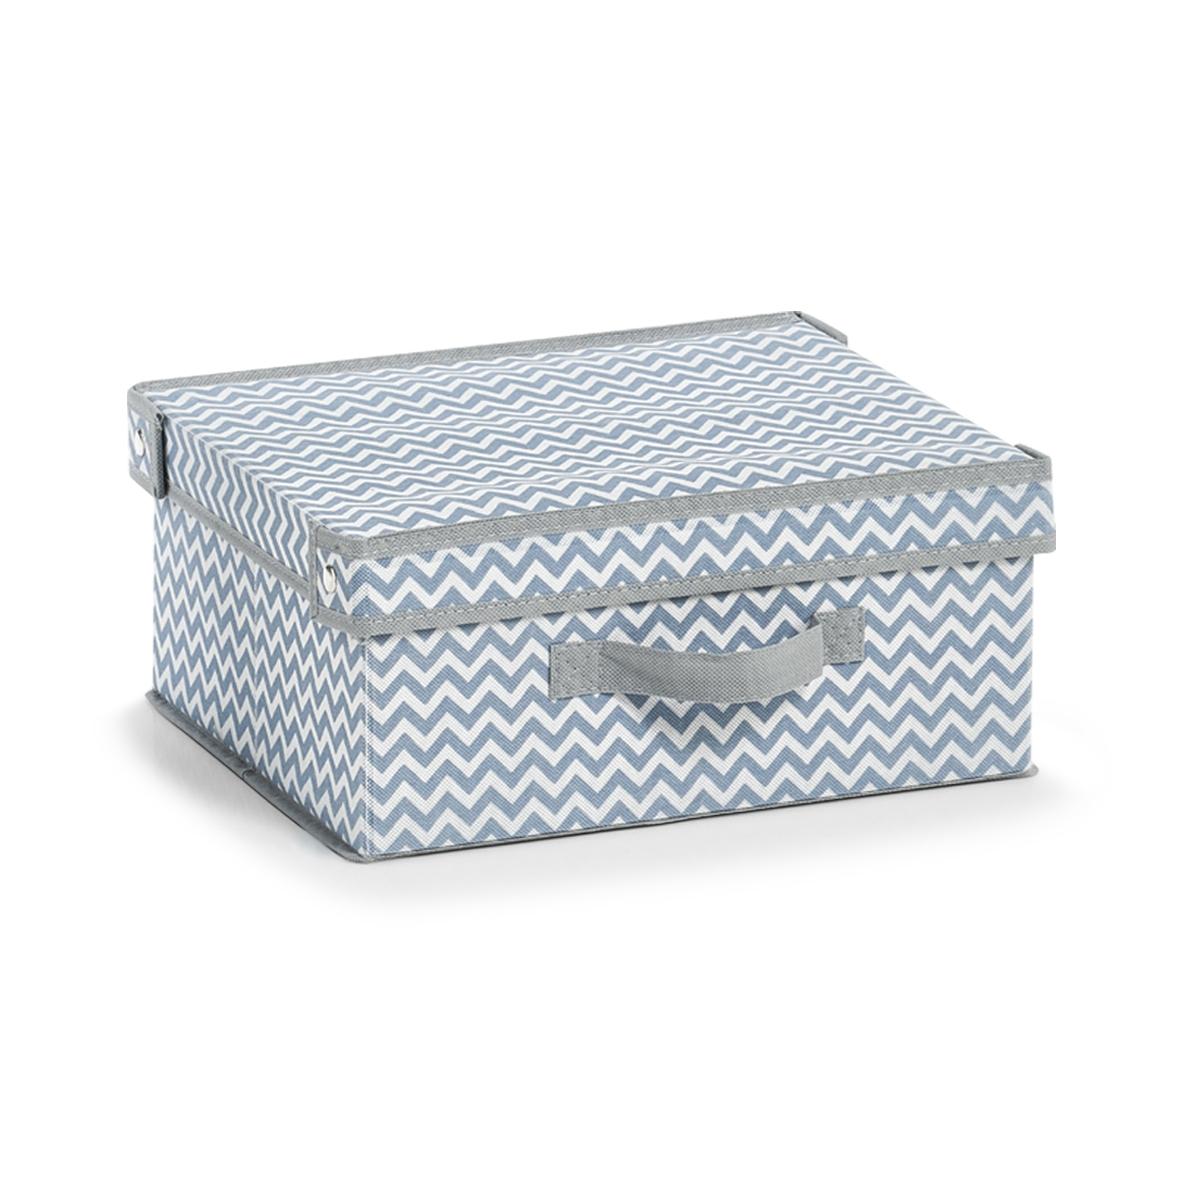 Organizator textil pliabil pentru sertar cu capac, Alb / Gri Zig Zag, l33xA28xH15 cm imagine